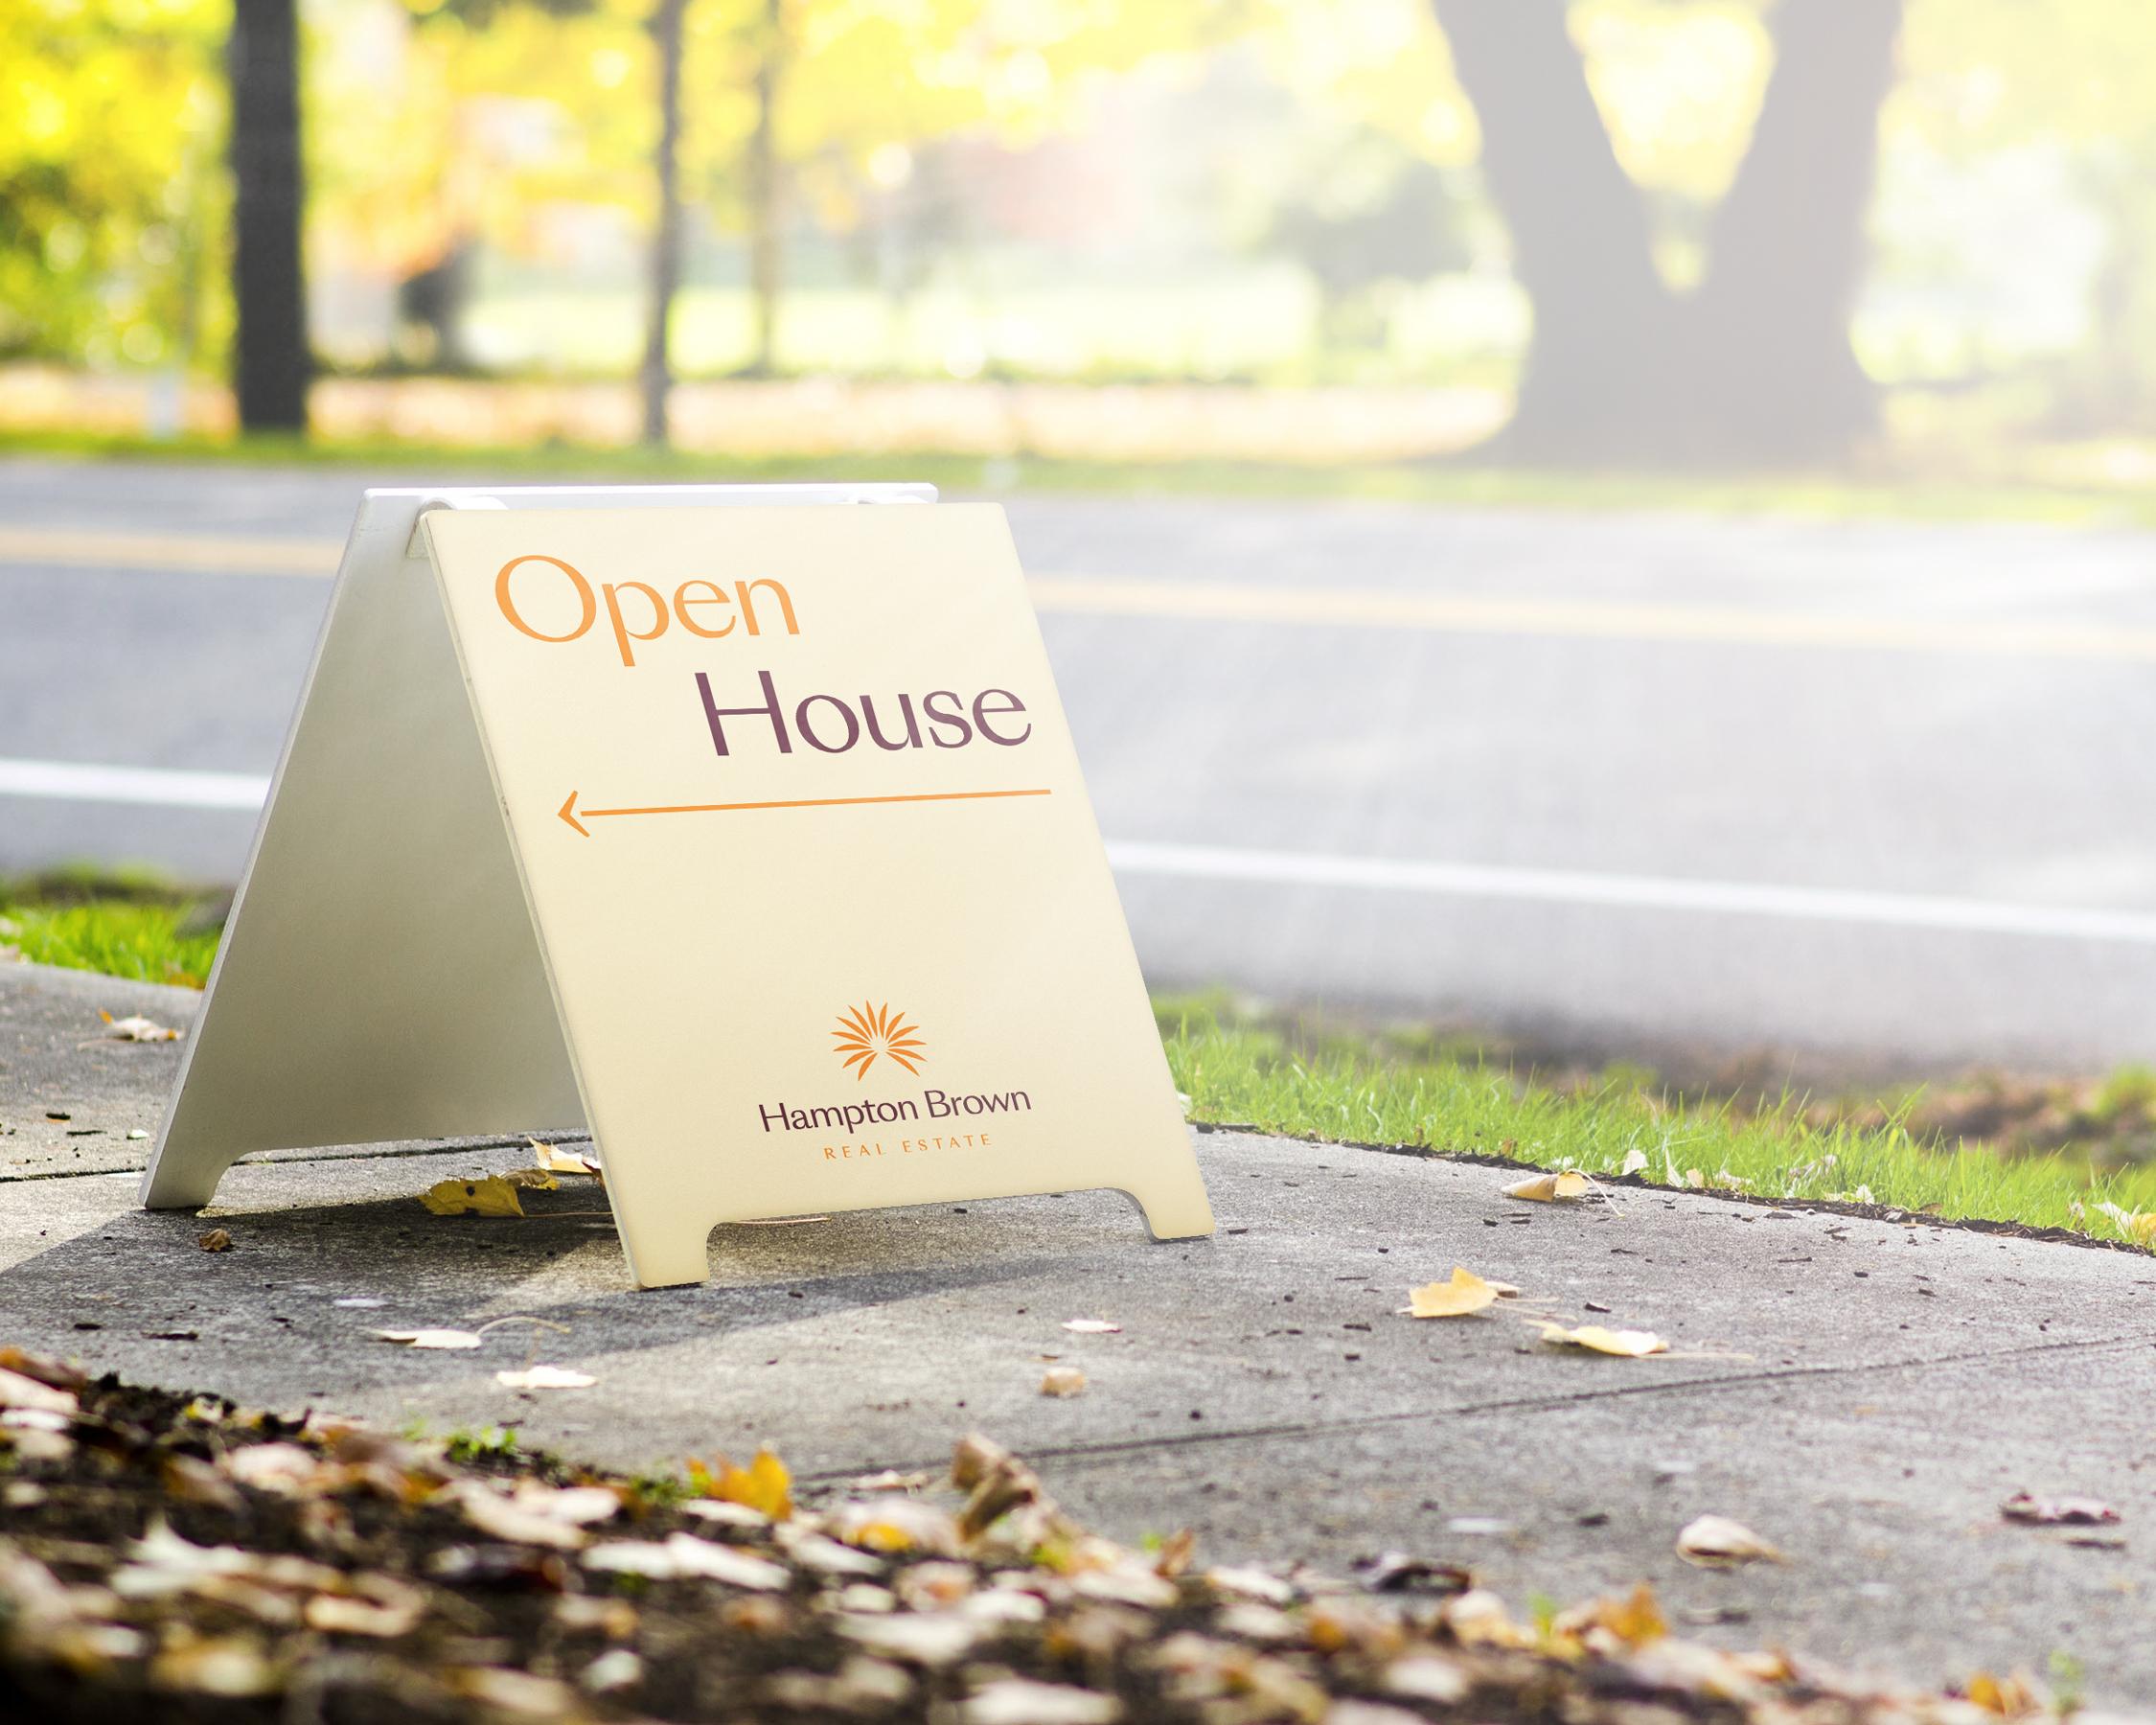 Hampton Brown open house a-board design on suburban pavement outside home